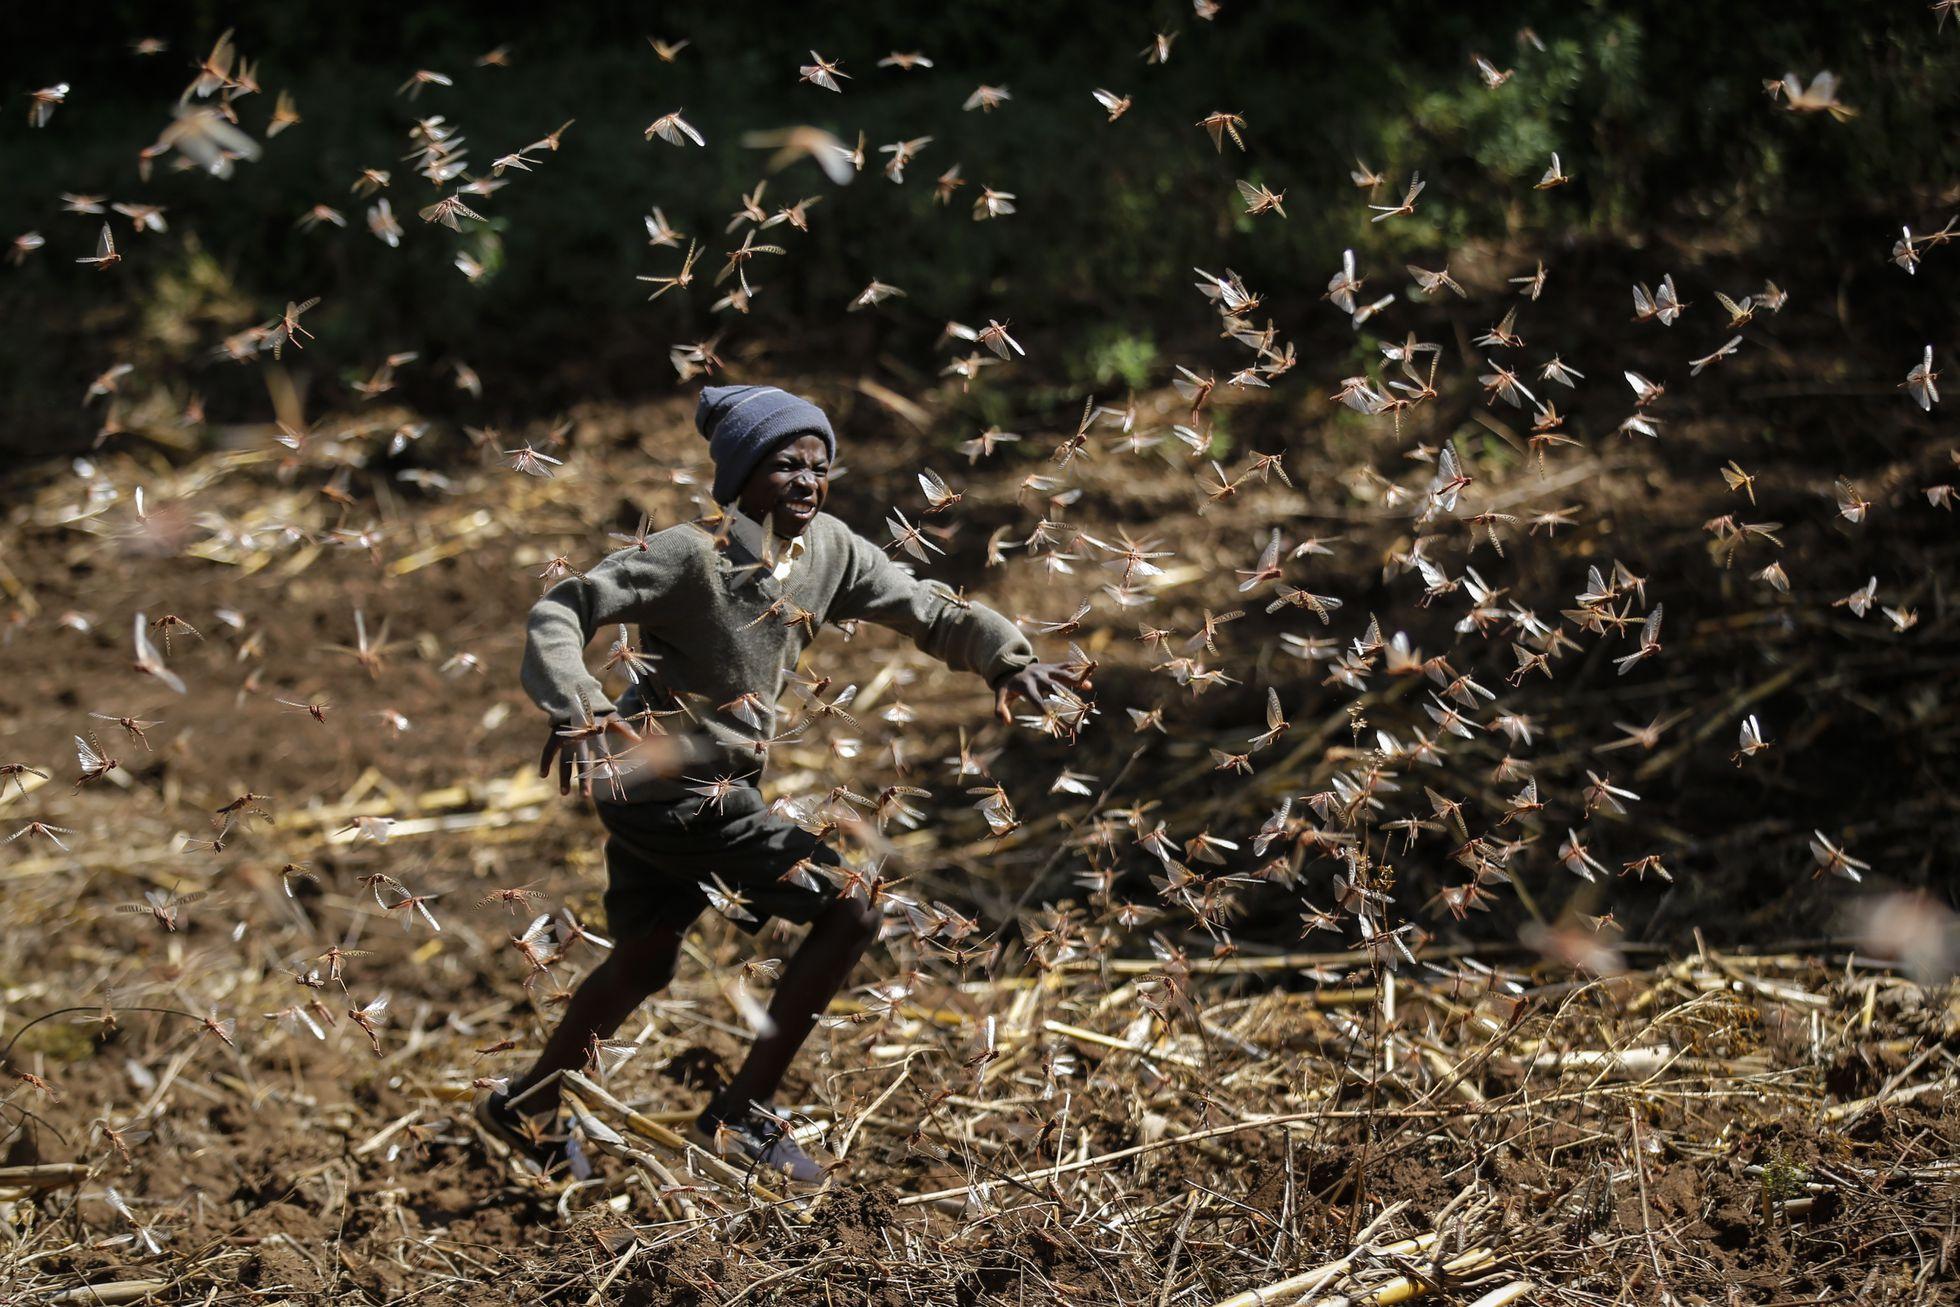 Locust swarms: How Kenya is controlling locust plagues ...